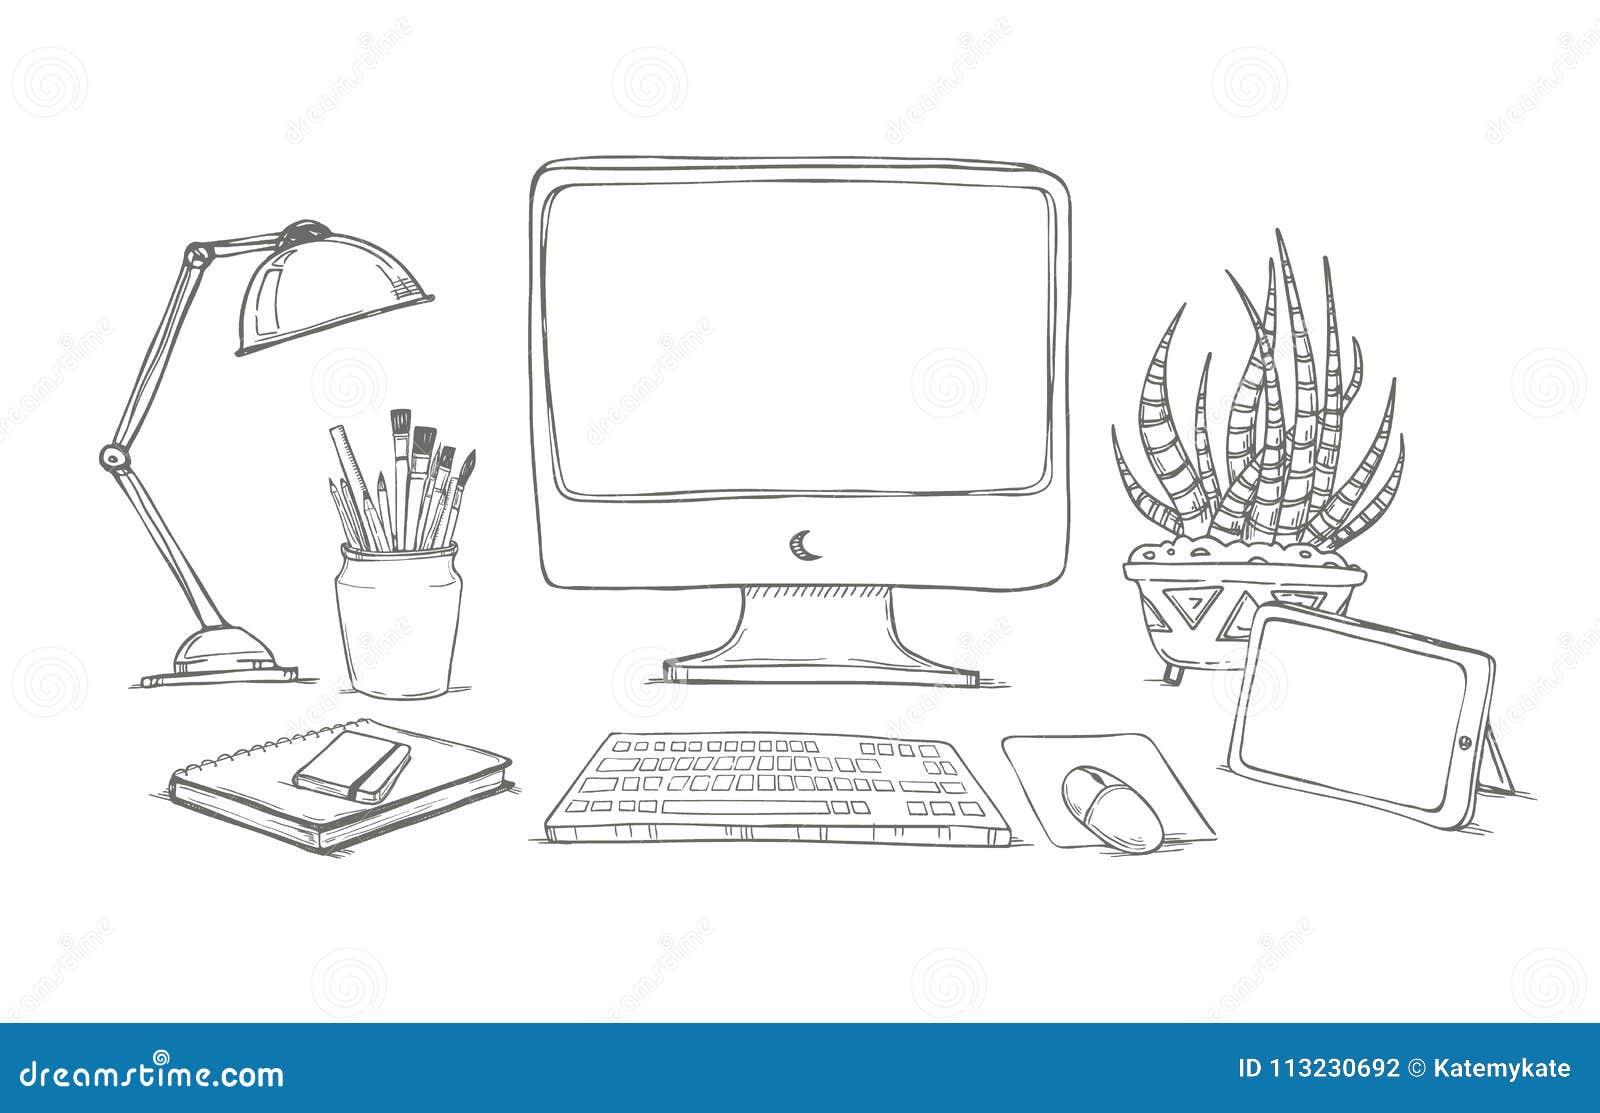 Ubergeben Sie Gezogene Vektorillustration Konzept Der Kreativen